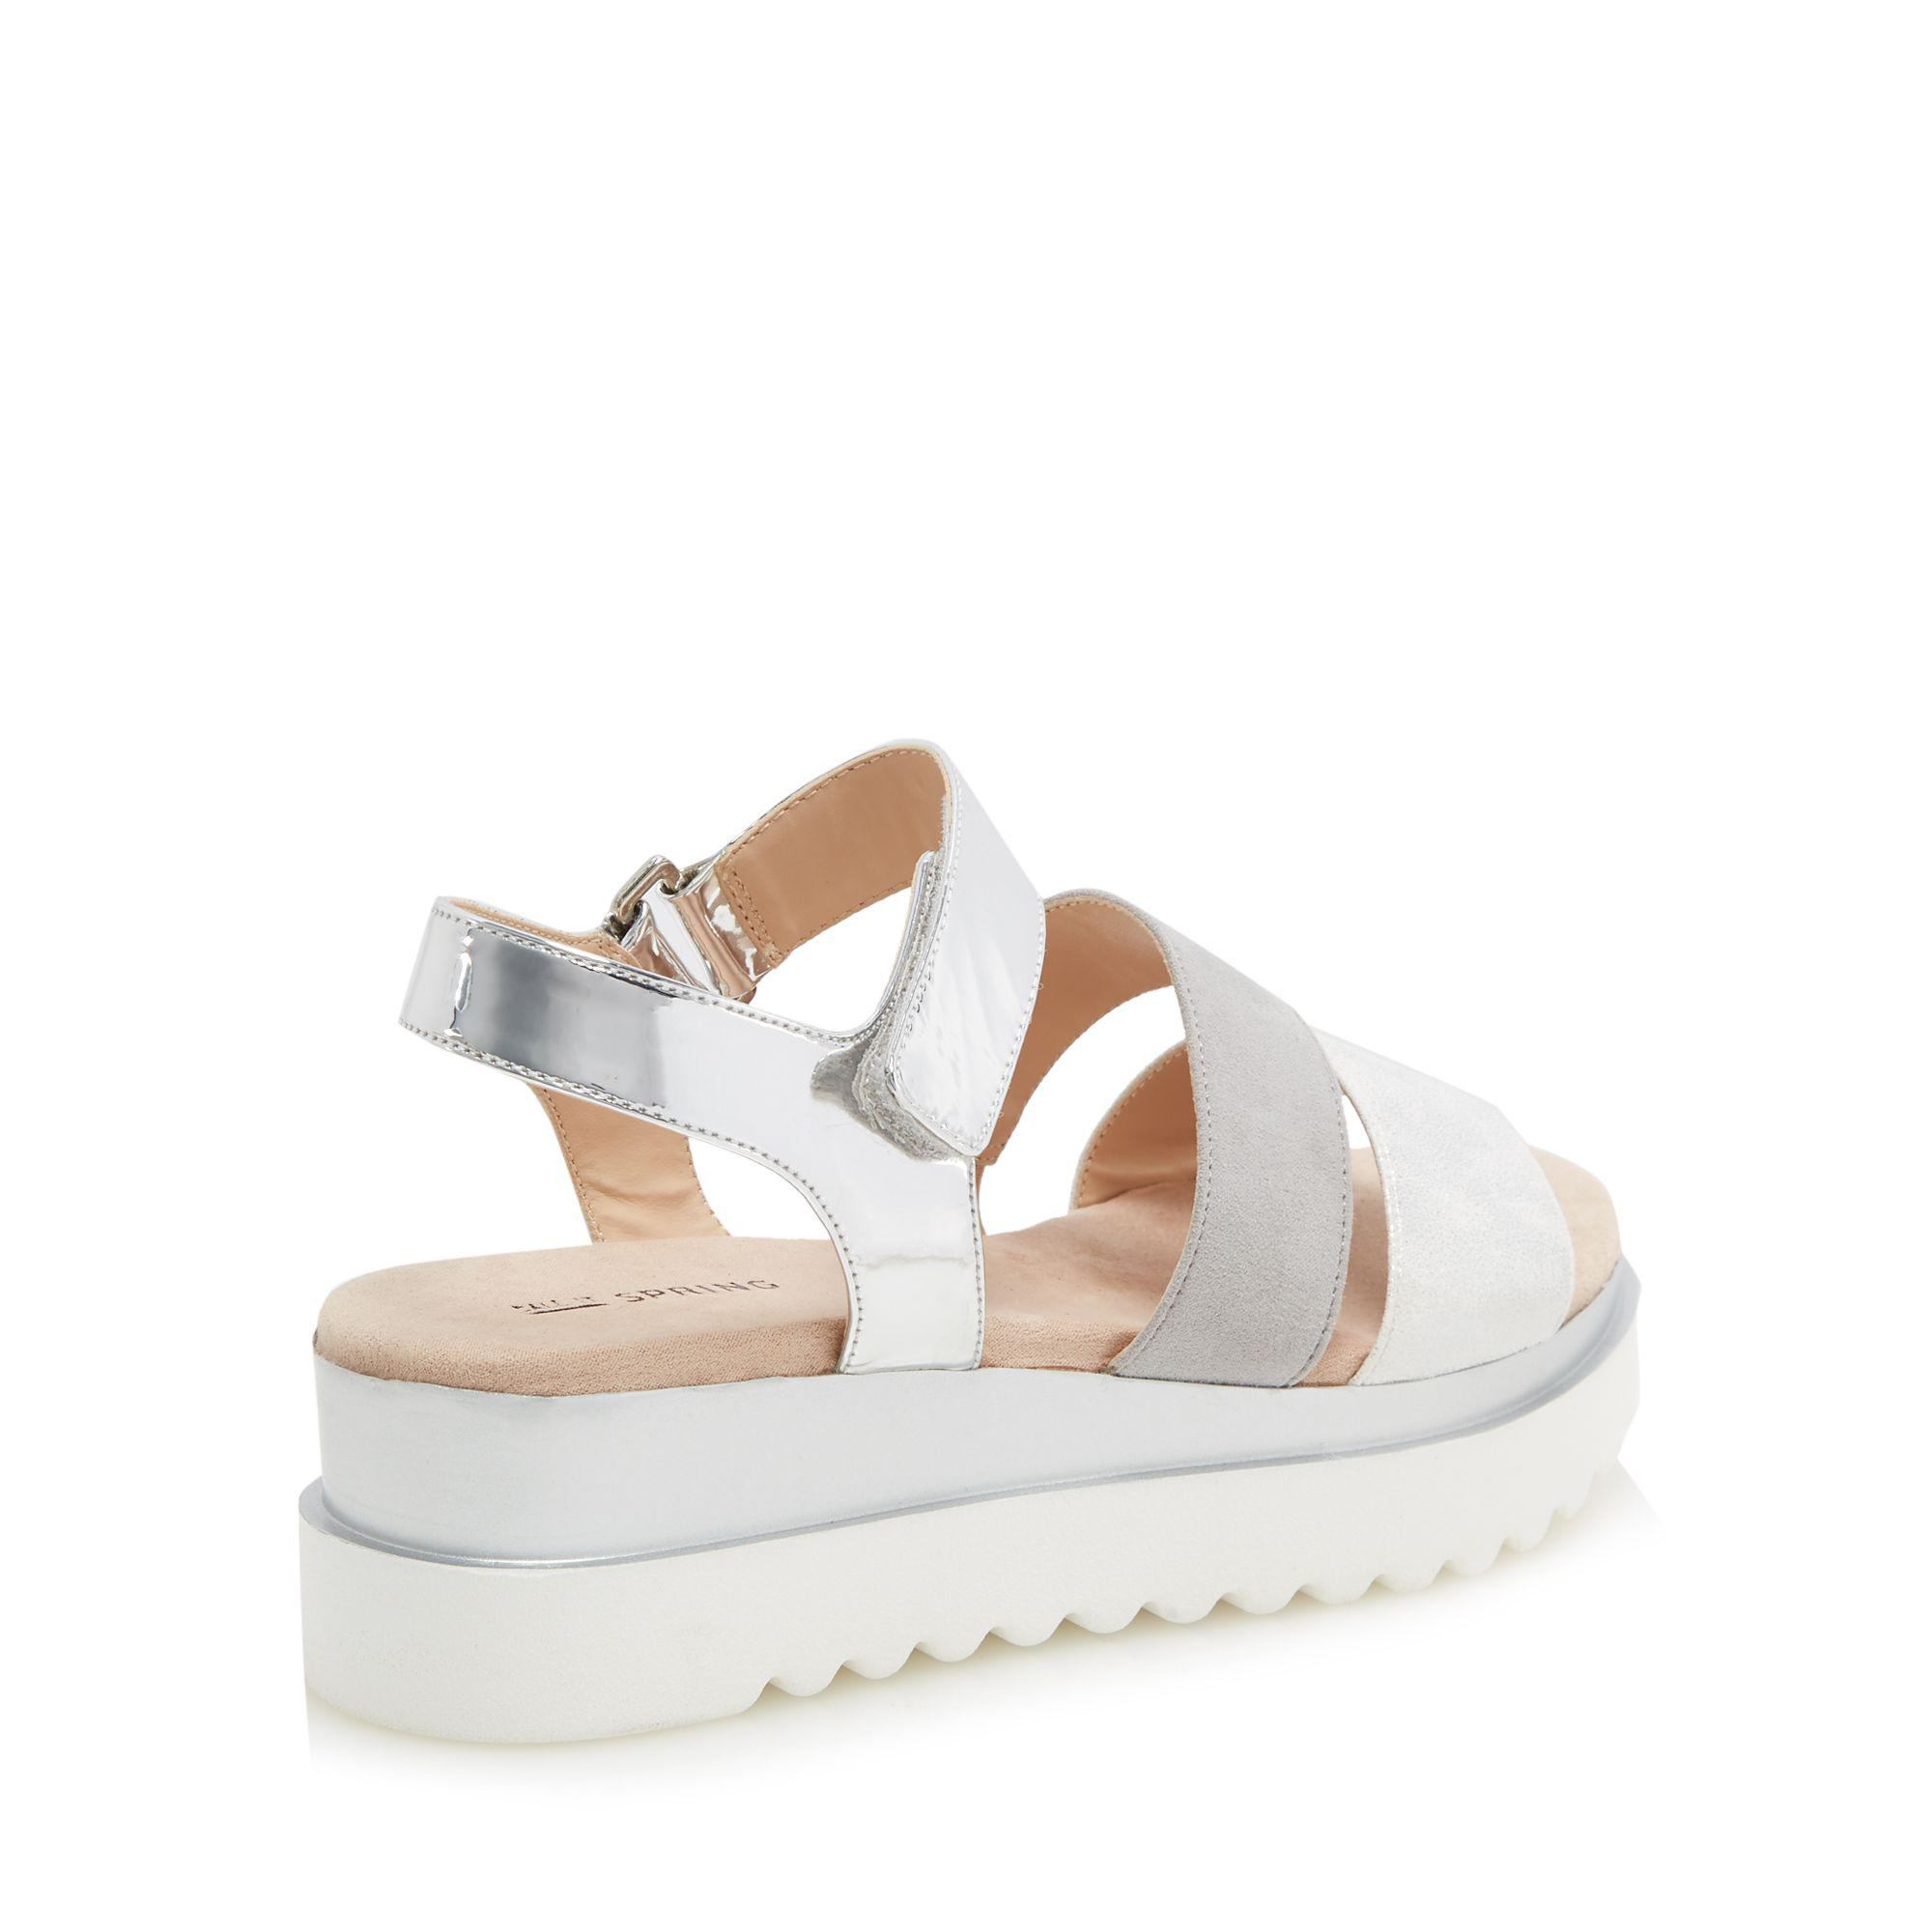 4421d1ebd78 Call It Spring Silver  yboreni  Mid Flatform Heel Ankle Strap ...